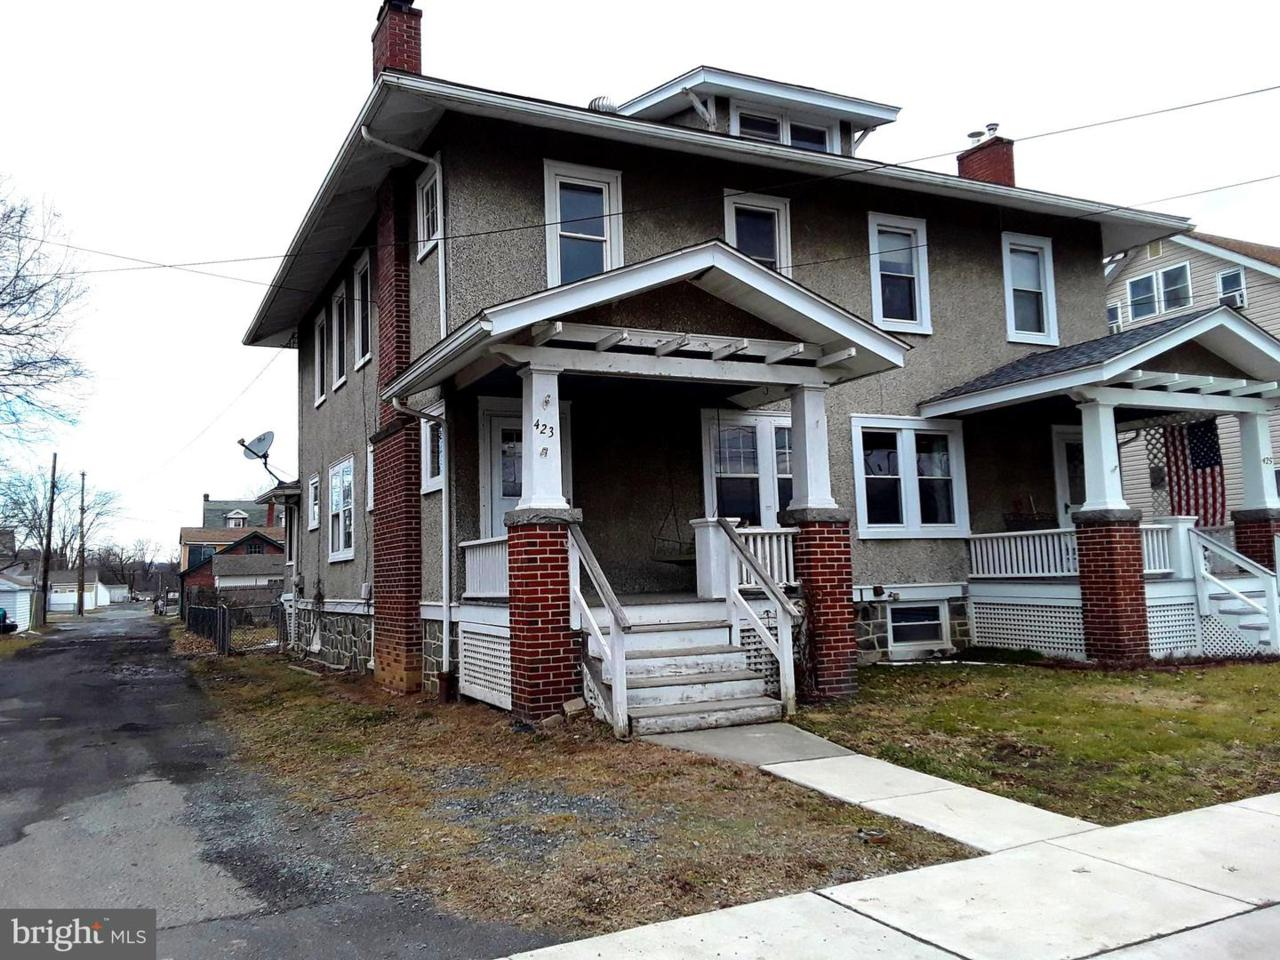 423 Elm Street - Photo 1